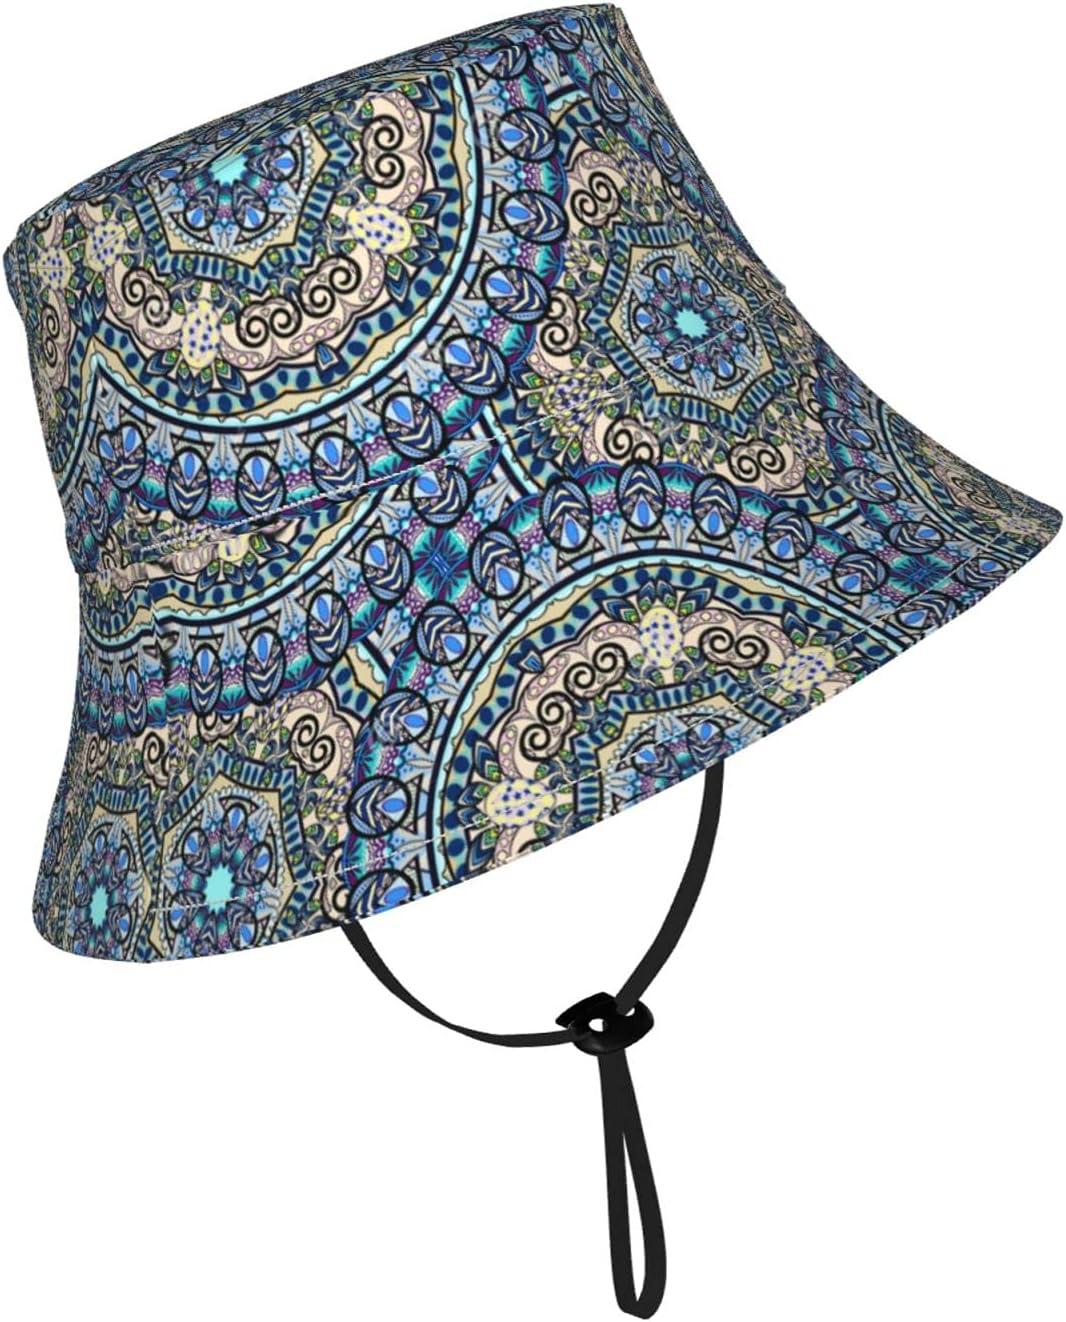 Jsragt Mandala Kids Sun Hat Hats Breathable Fisherman Adjustable Max 77% Free shipping on posting reviews OFF